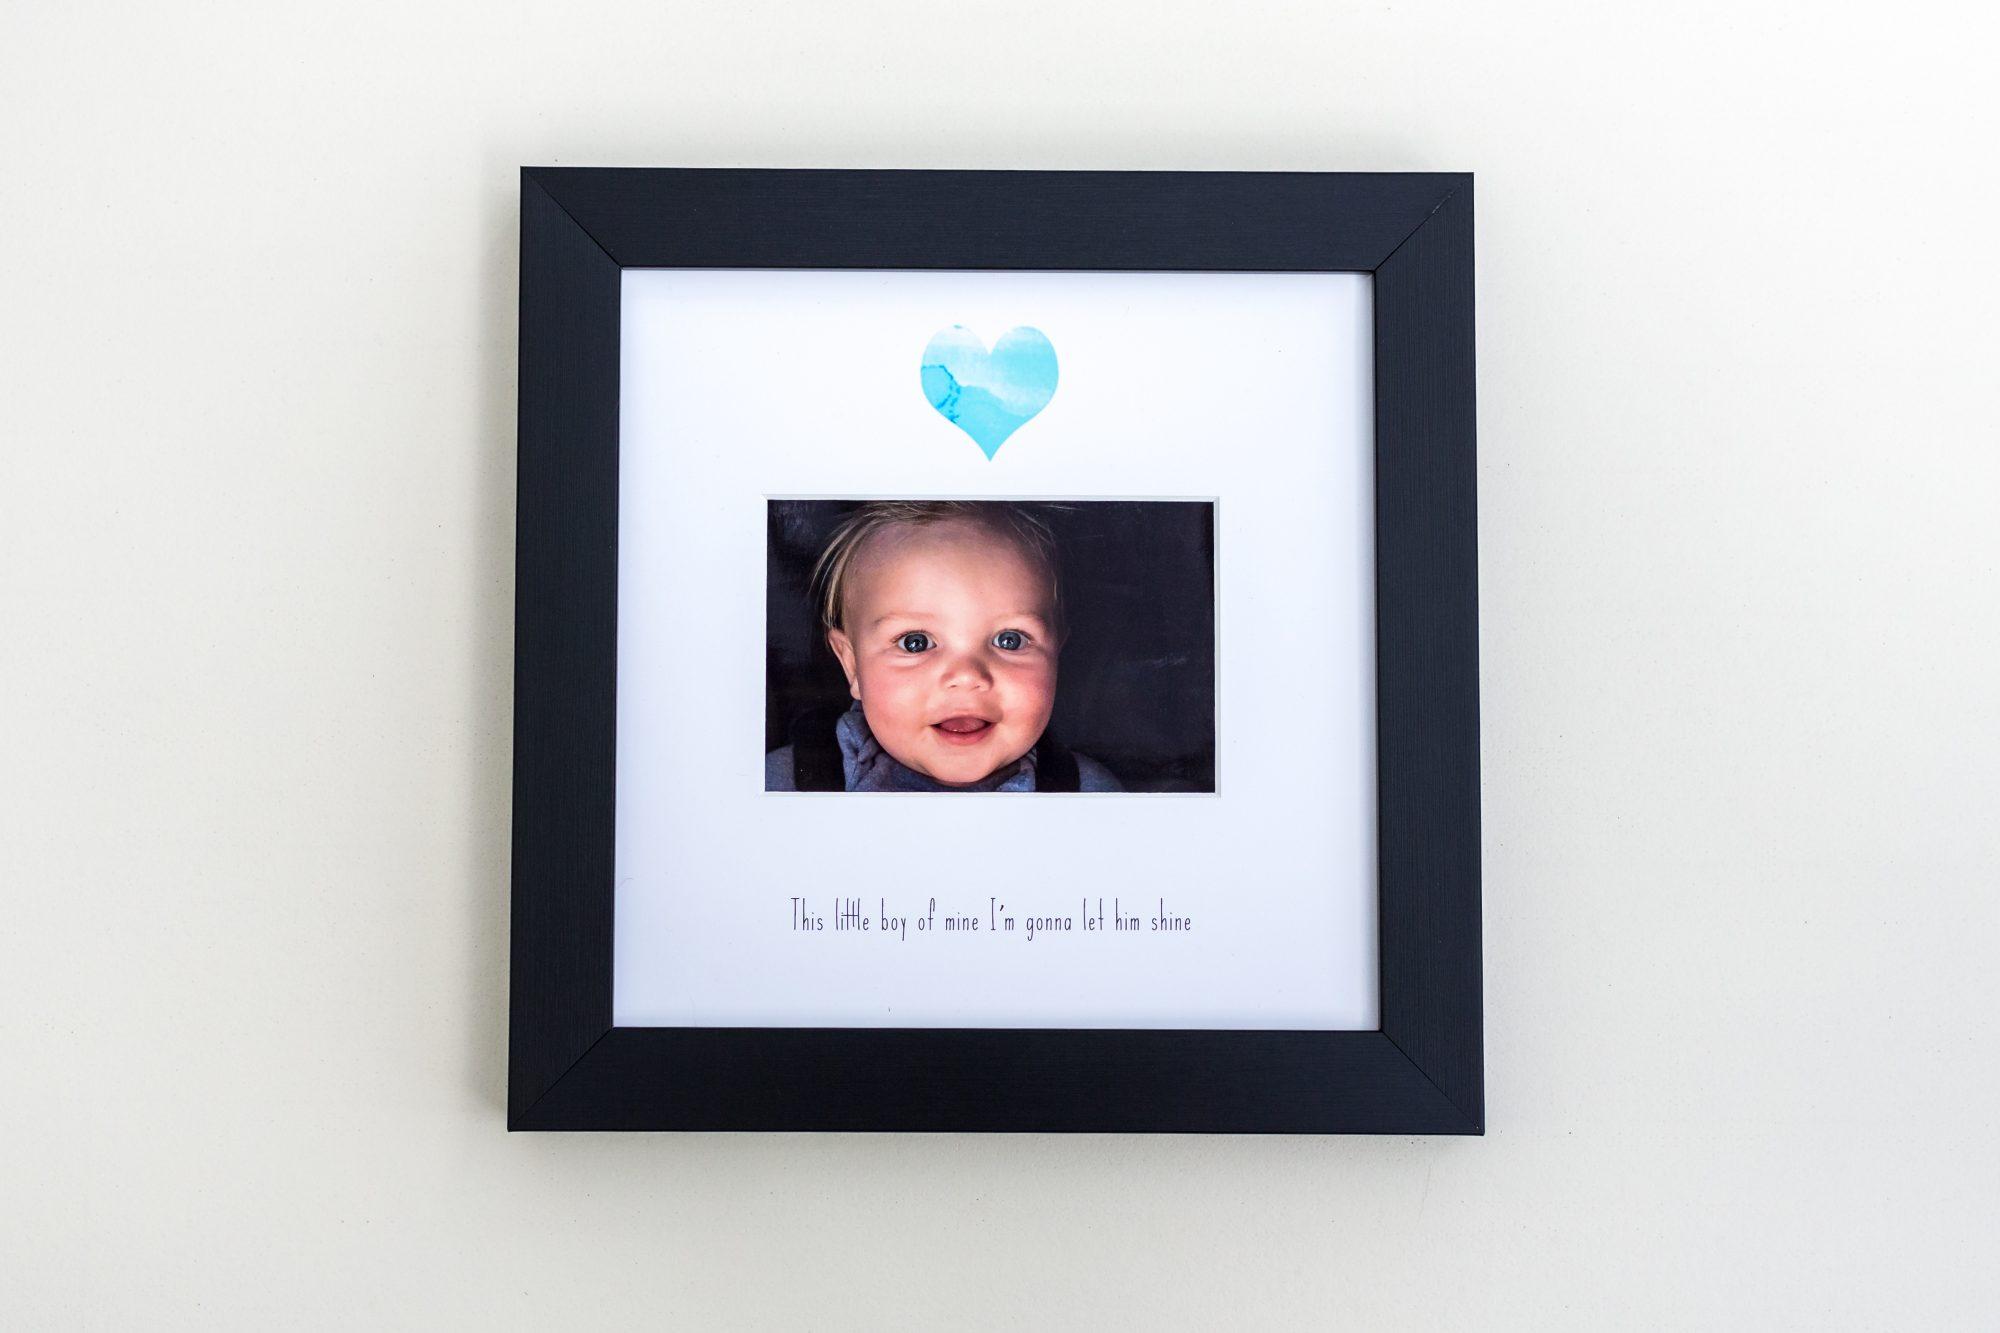 Casting Love photo frame